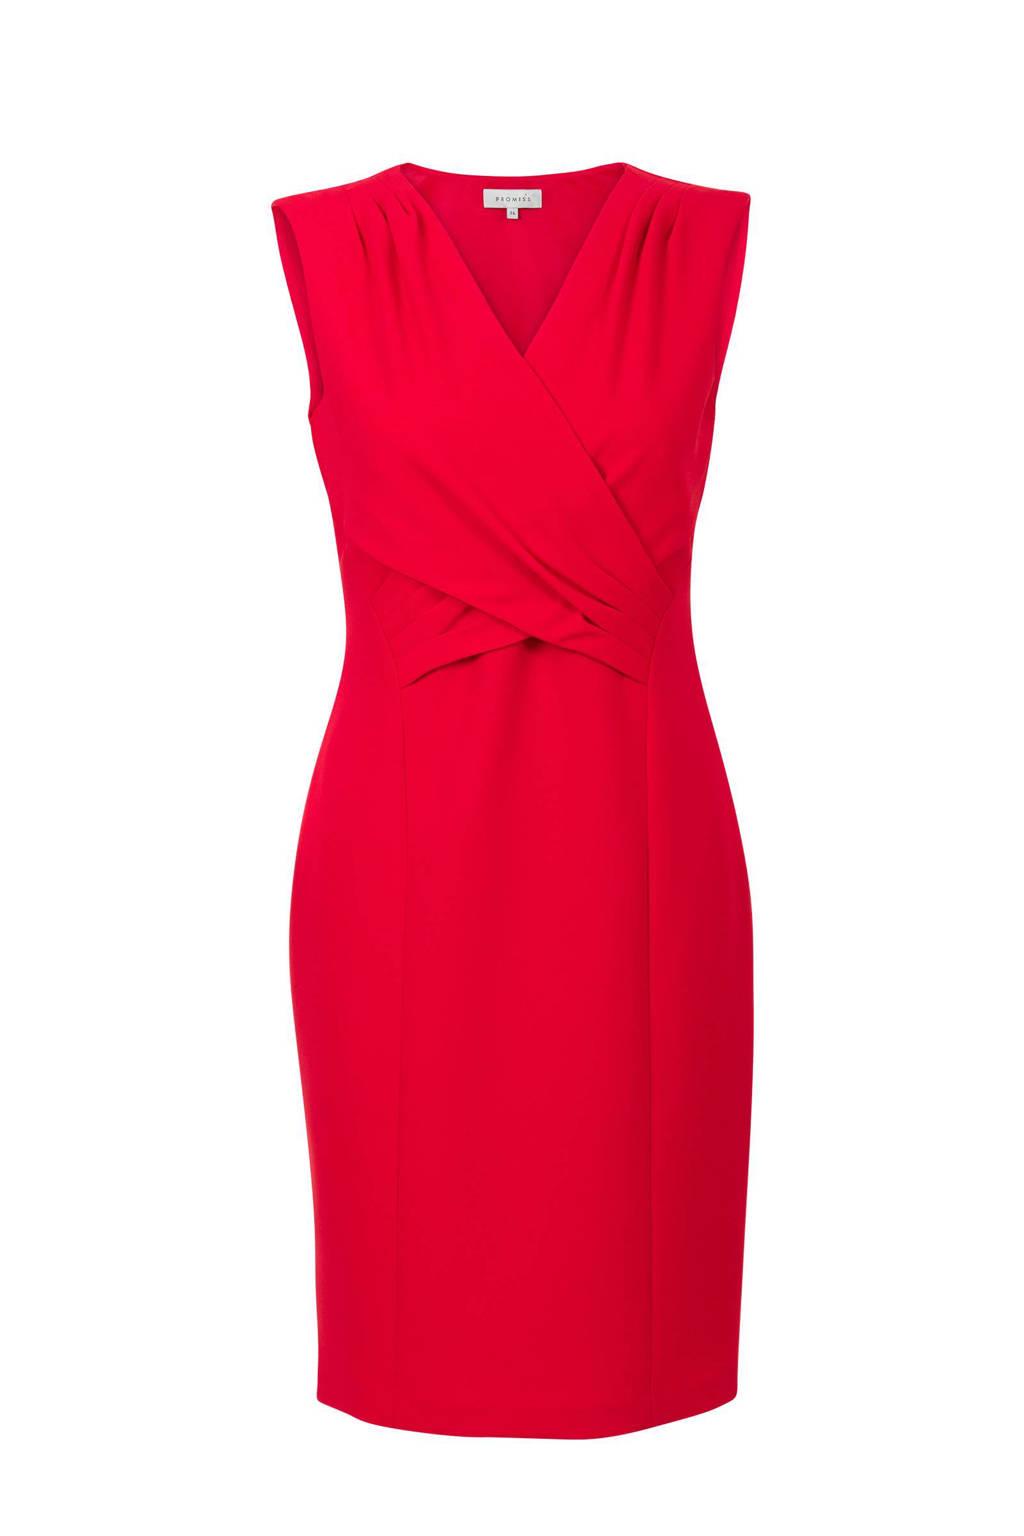 Promiss jurk met overslagdetail roze, Framboos roze